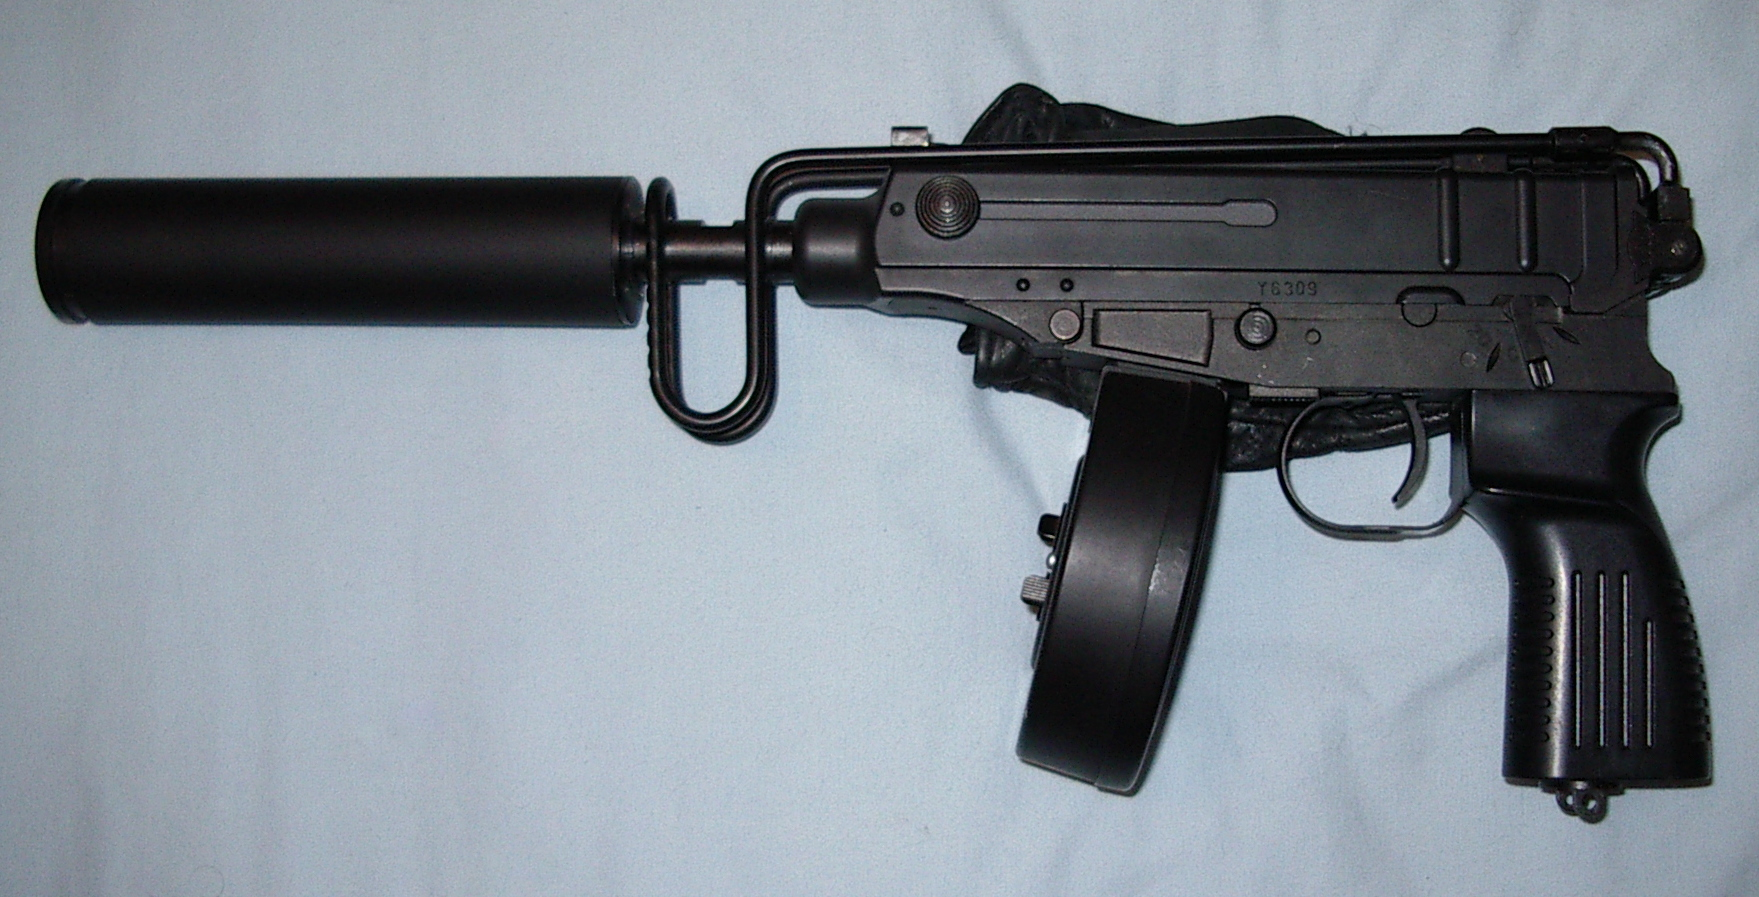 �7��|�N<�^}�M_十,vz. 61蝎式冲锋枪,1961年型冲锋枪,是一款由捷克斯洛伐克制造的7.